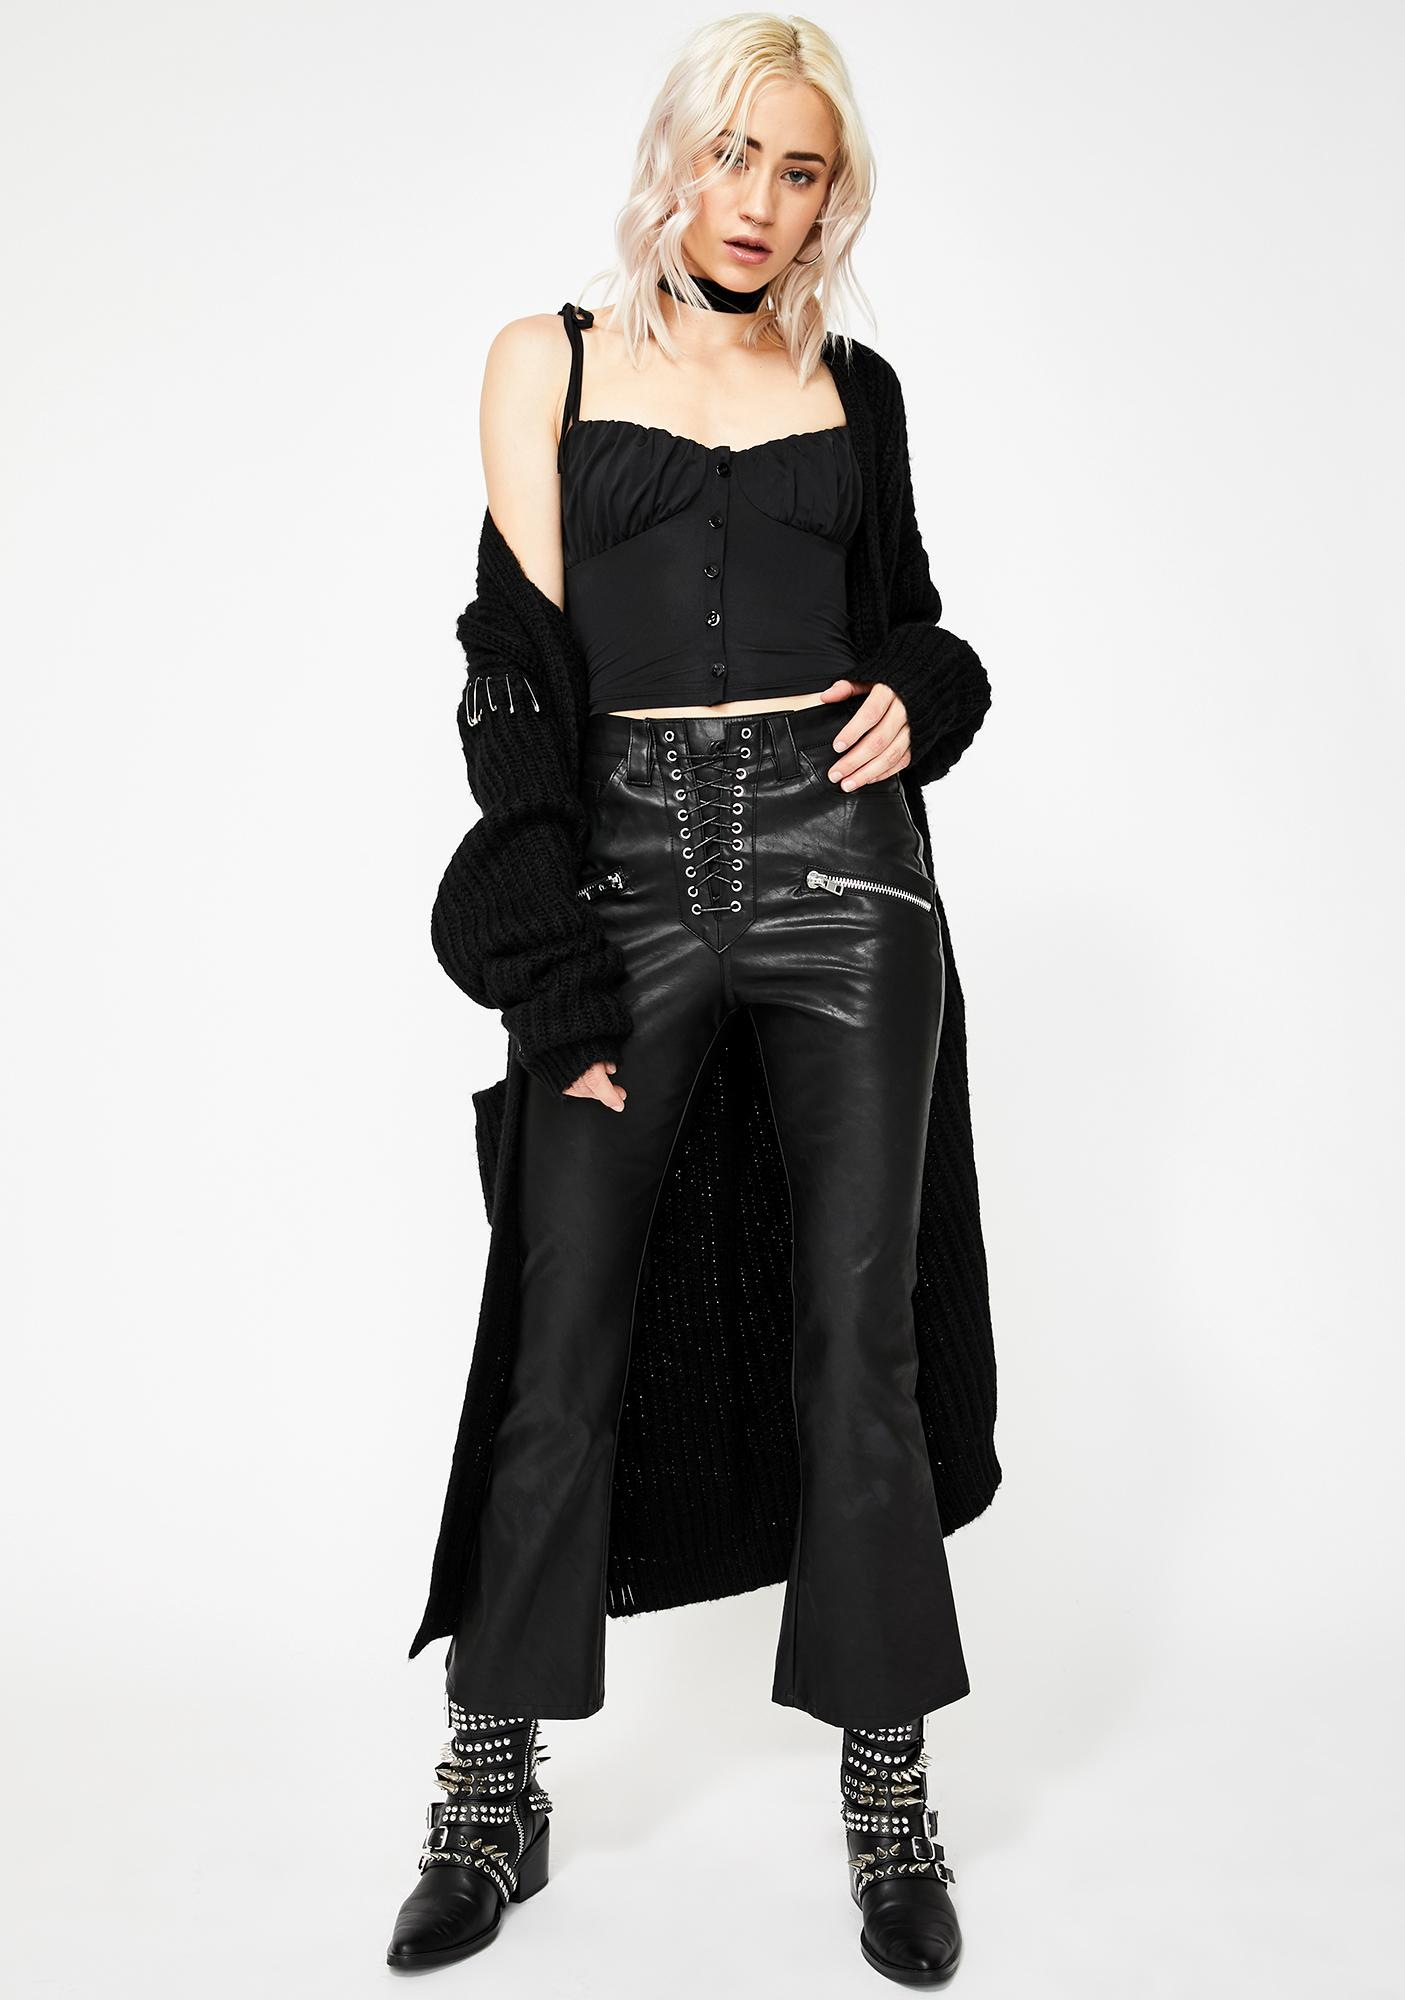 Kiki Riki Black Feelin' Femme Bustier Top